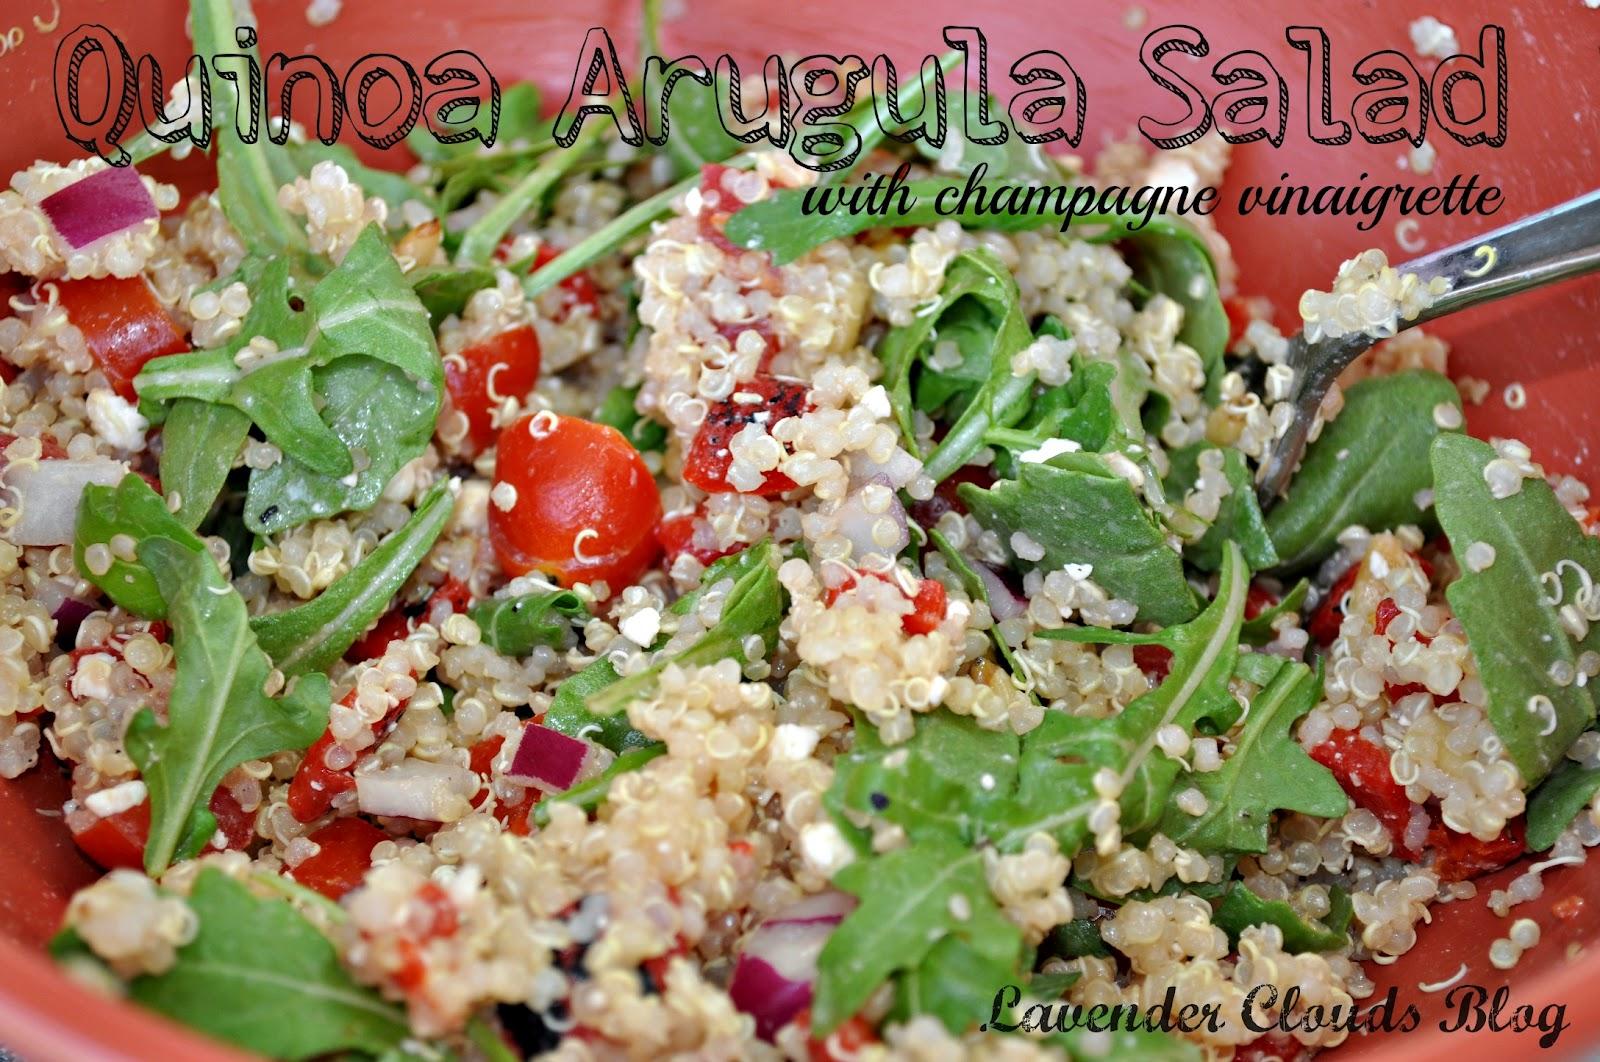 salad pork milanese with arugula salad quinoa tabbouleh arugula salad ...